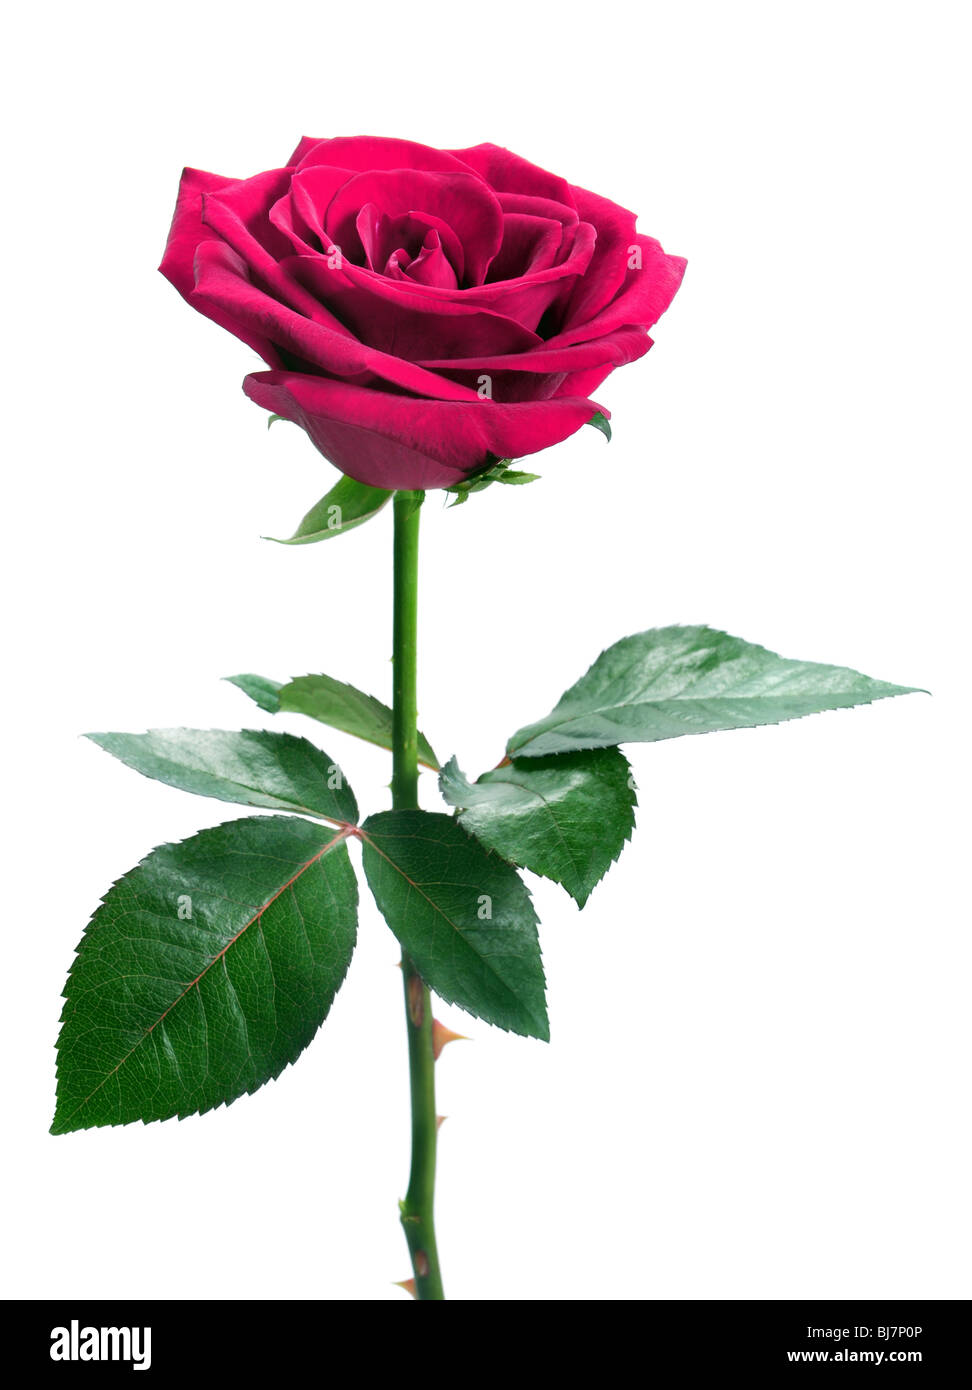 Rose rose isolé sur fond blanc Photo Stock